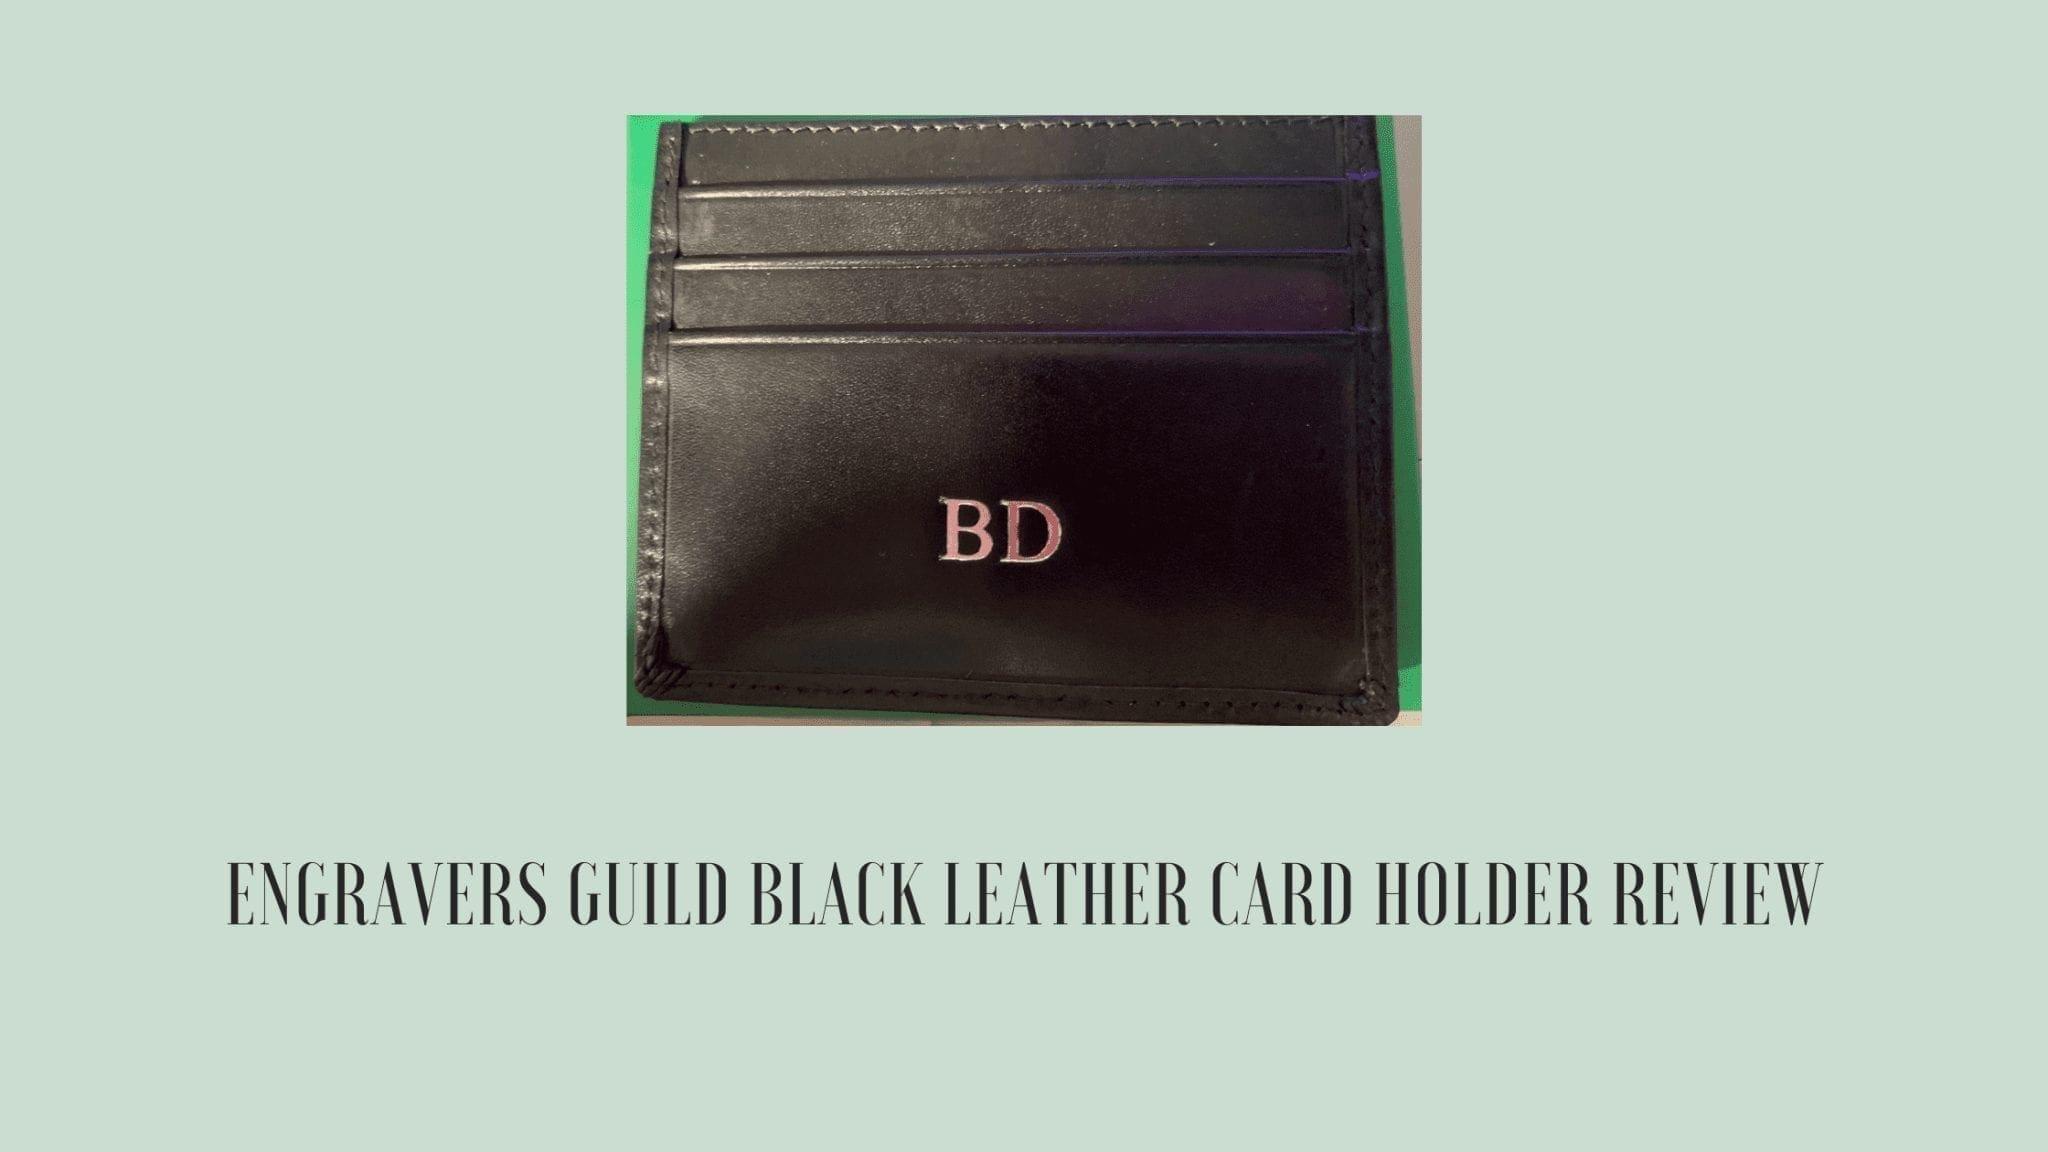 Engravers Guild Black Leather Card Holder Review